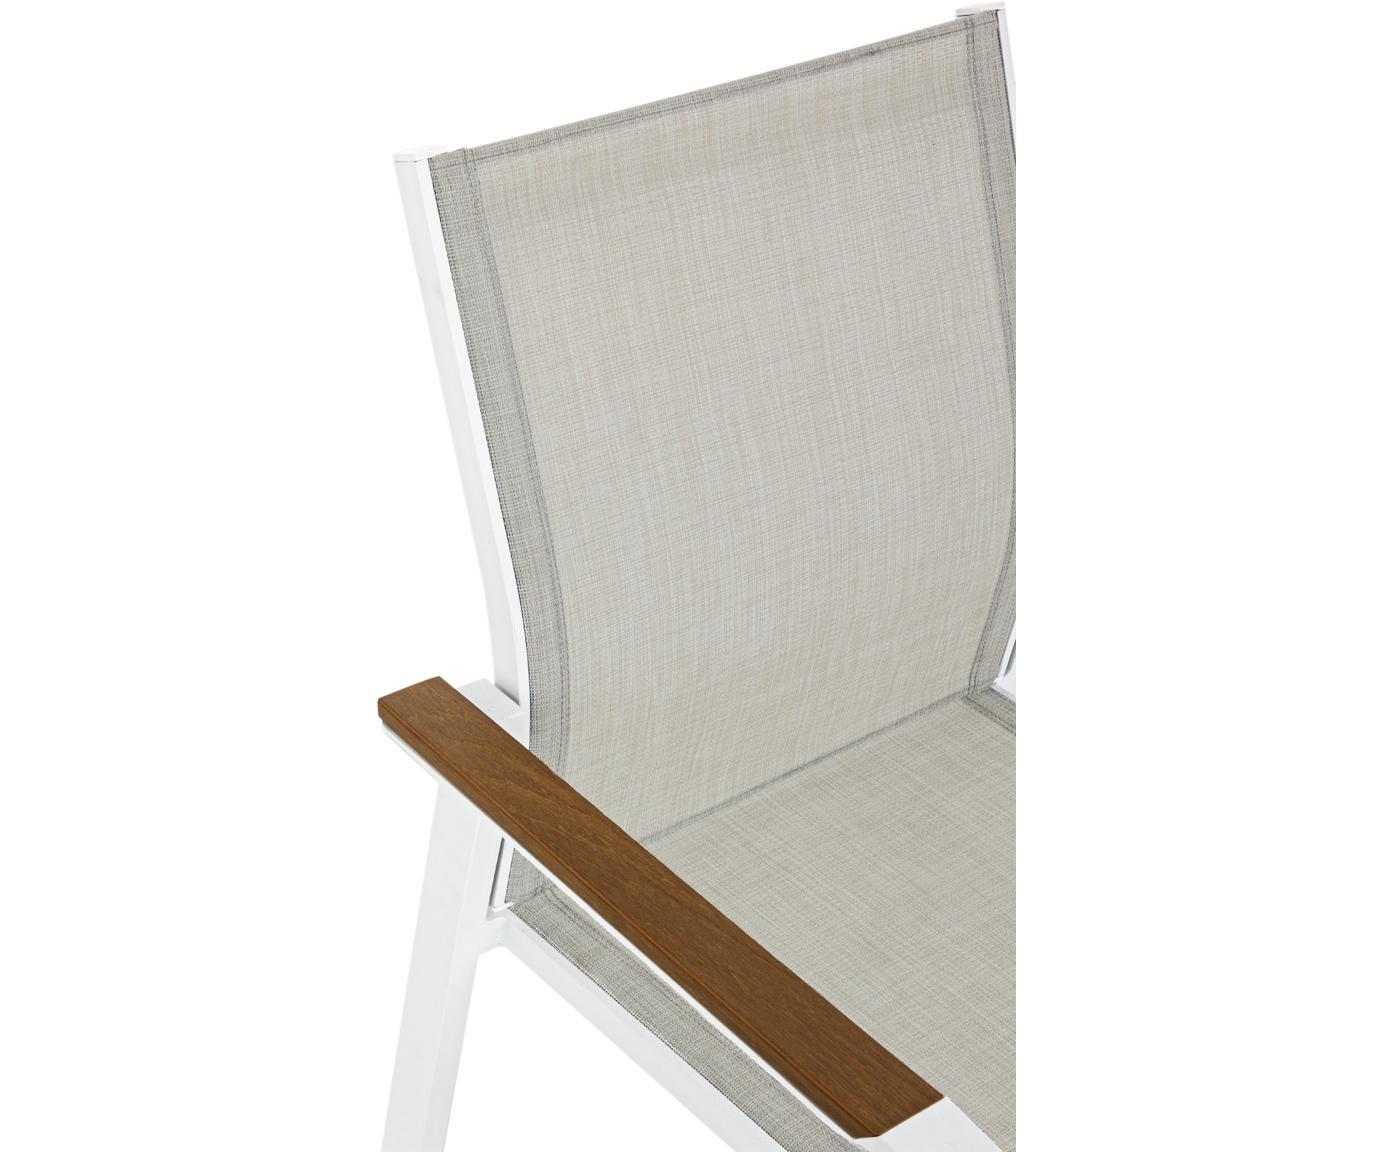 Stapelbare tuinarmstoel Elias, Frame: gepoedercoat aluminium, Zitvlak: Textilene, Wit, greige, hout, B 57 x D 62 cm